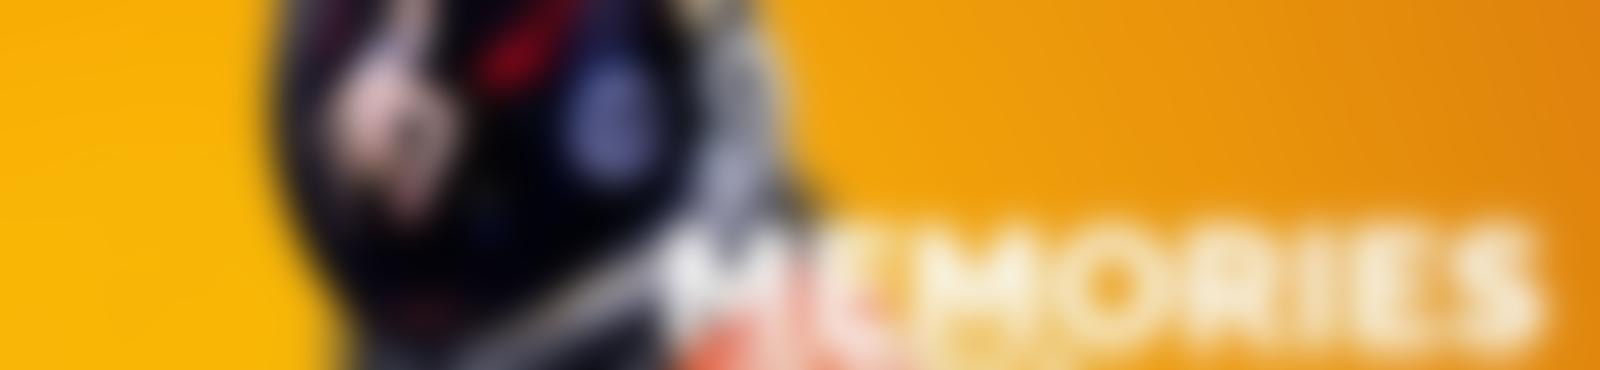 Blurred 9cdf5d57 185f 46a7 9a53 e8a2cc696bd4